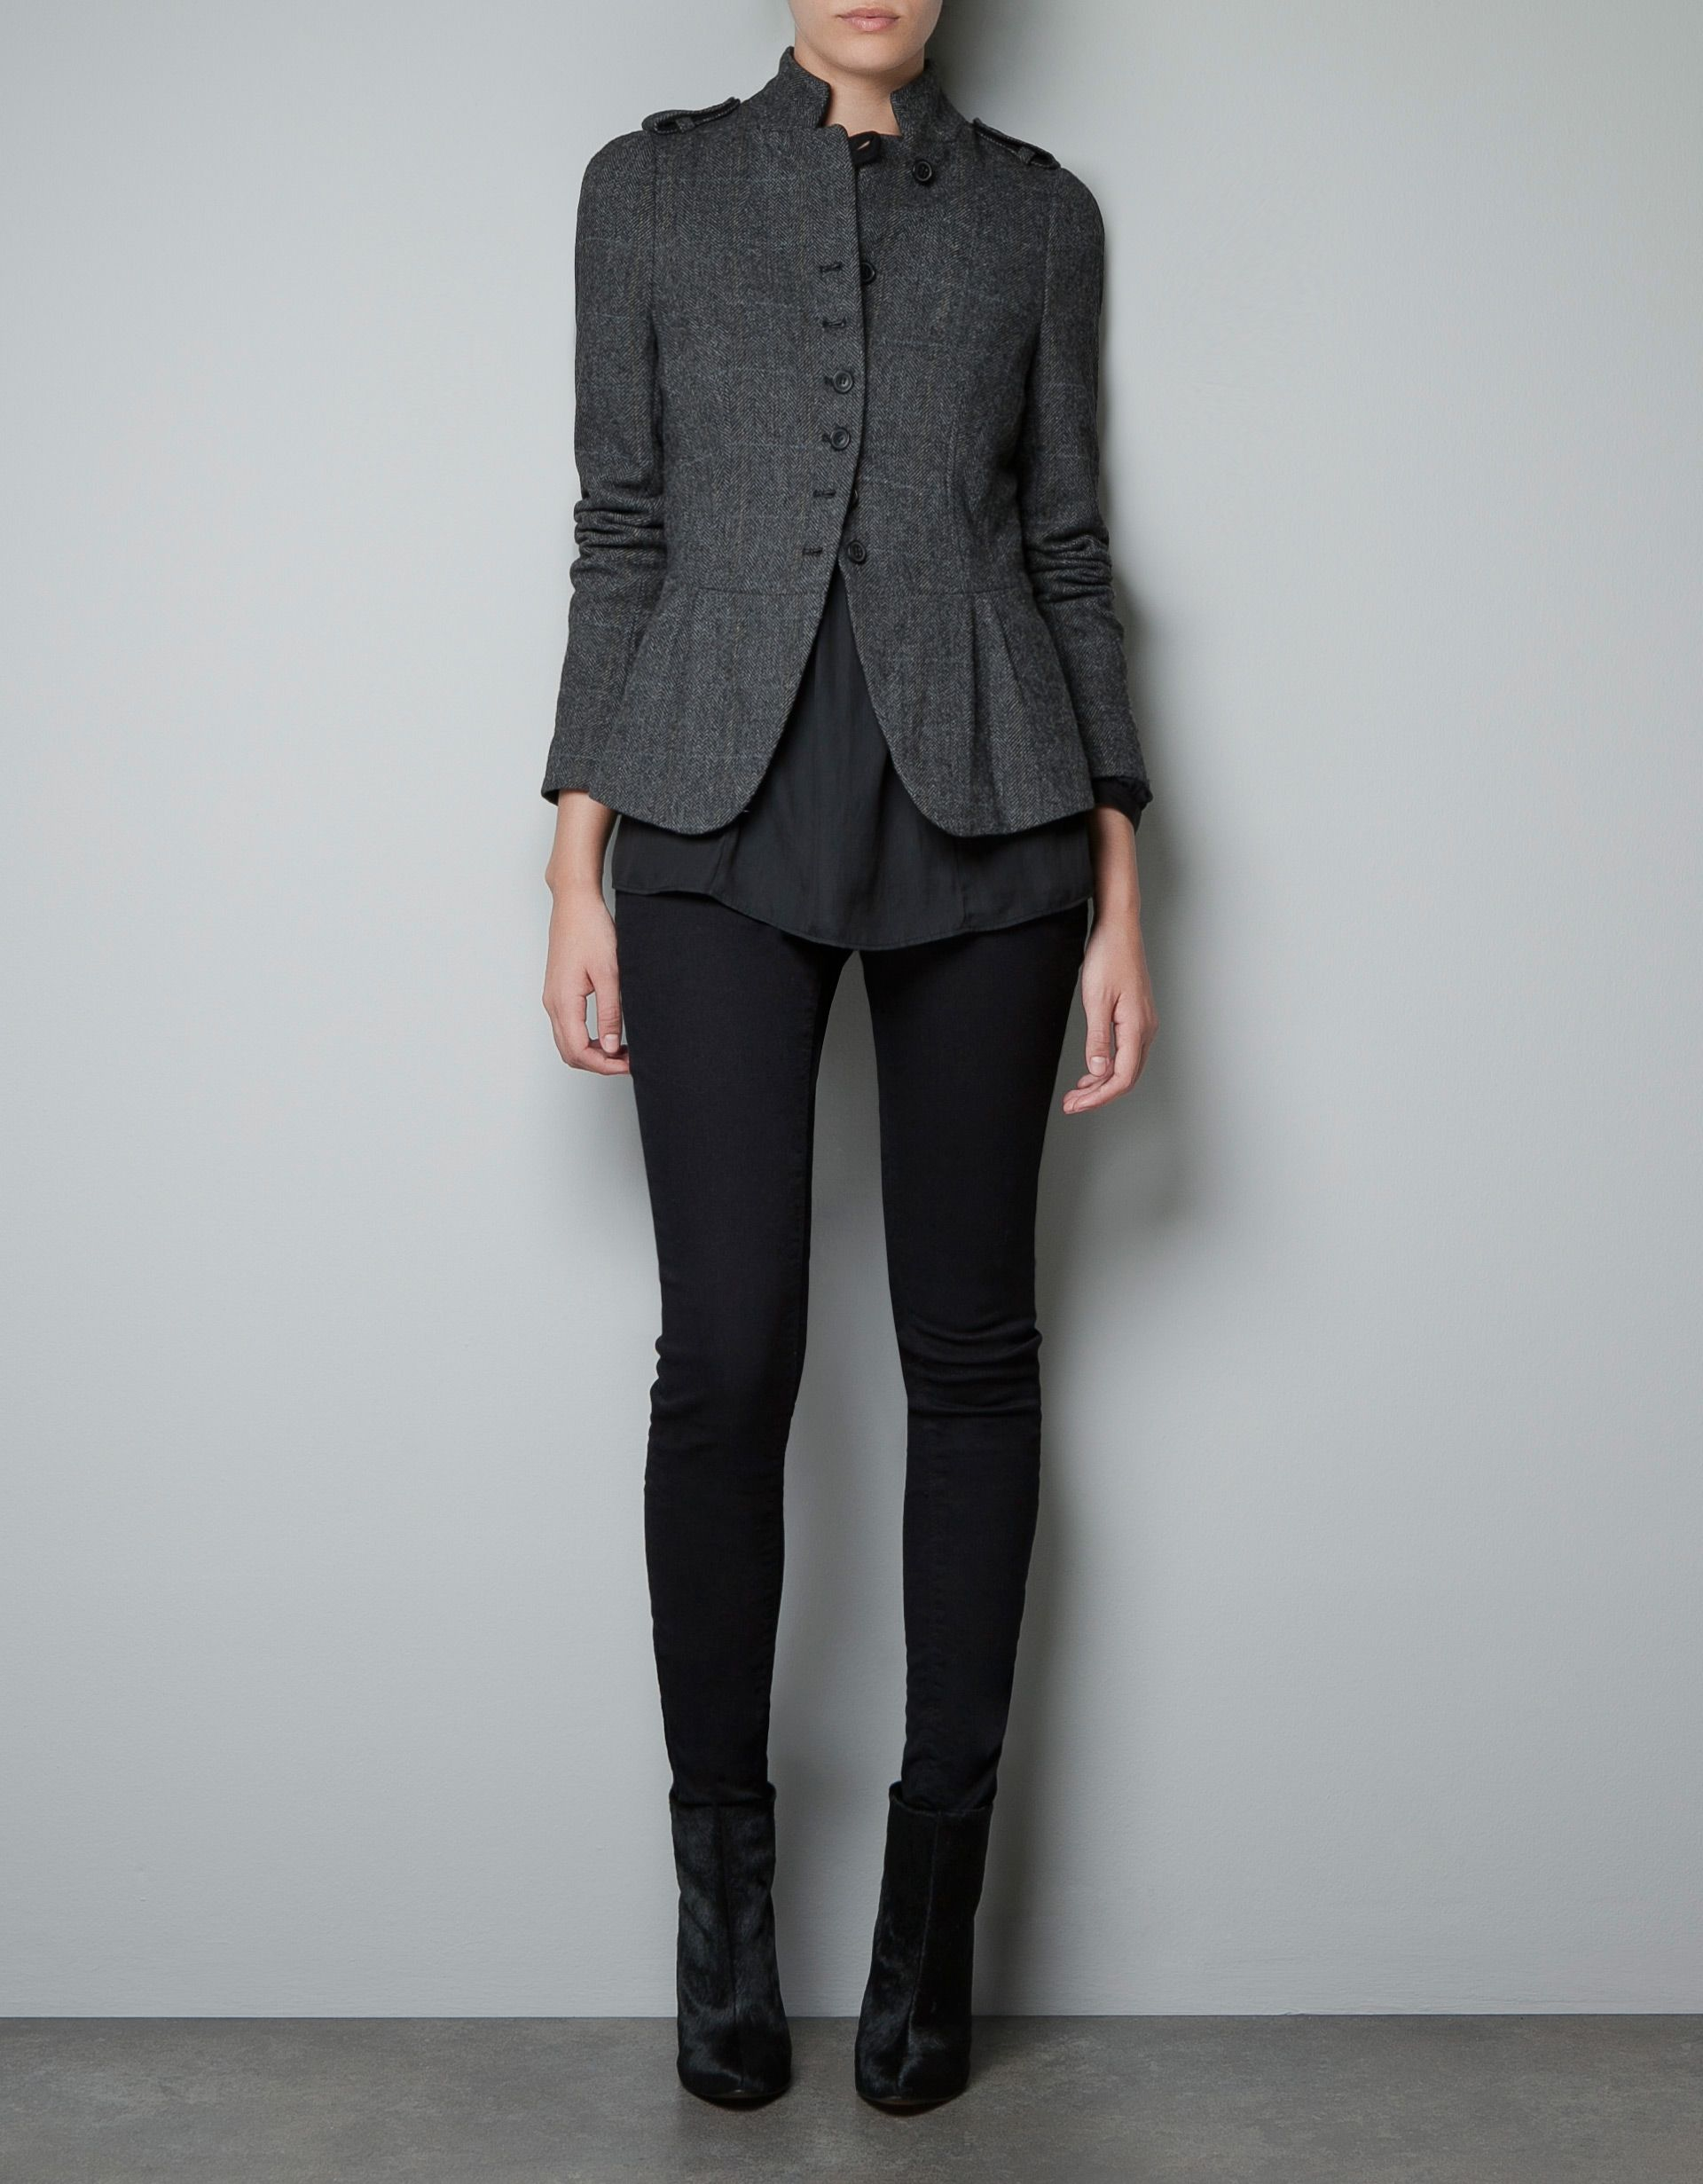 Veste tweed femme solde